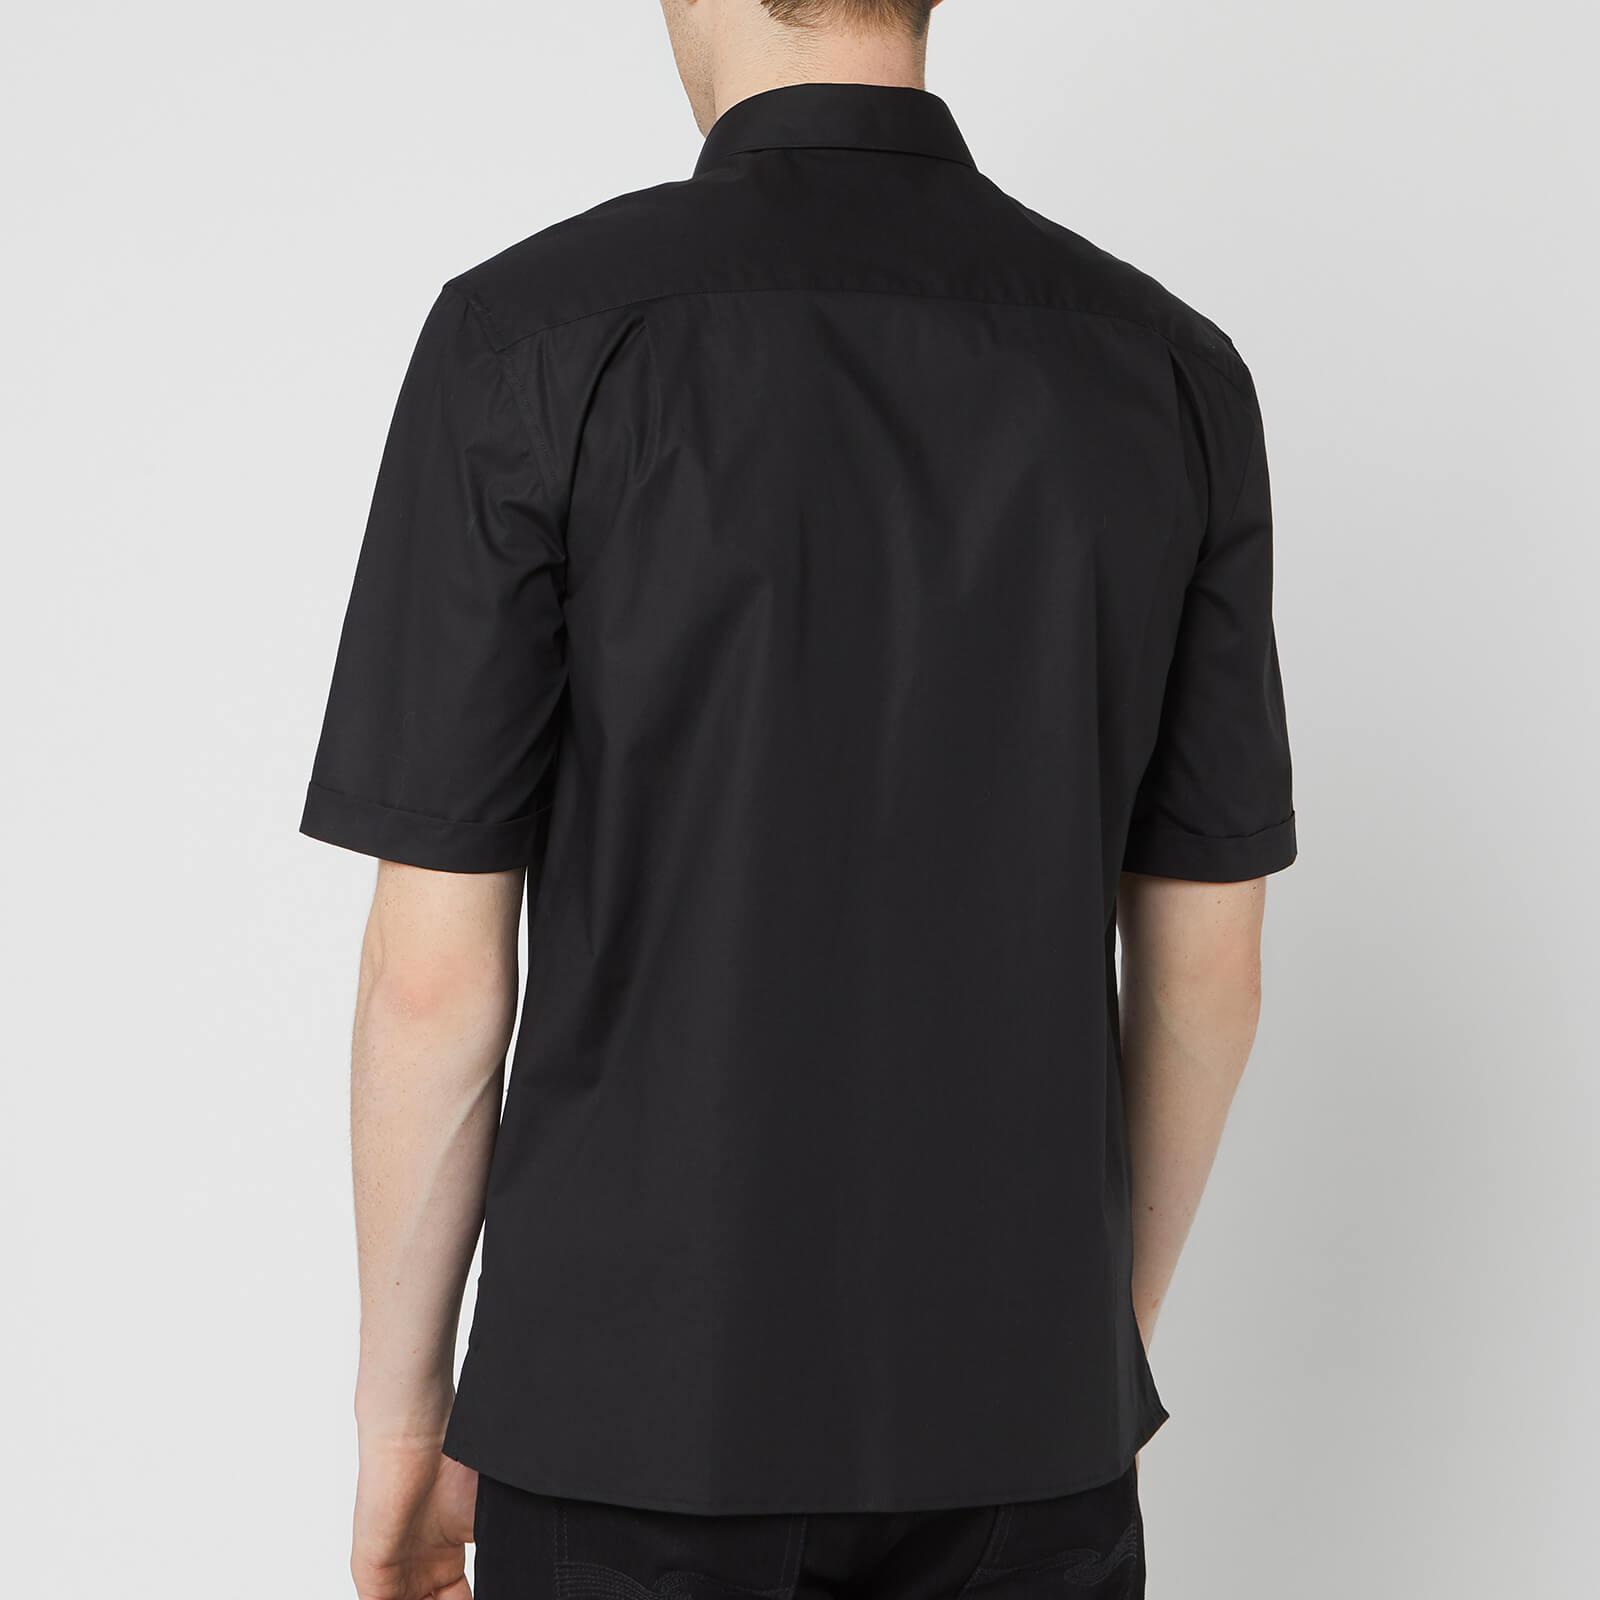 e0d9d445 Versace - Black Chest Medusa Shirt for Men - Lyst. View fullscreen